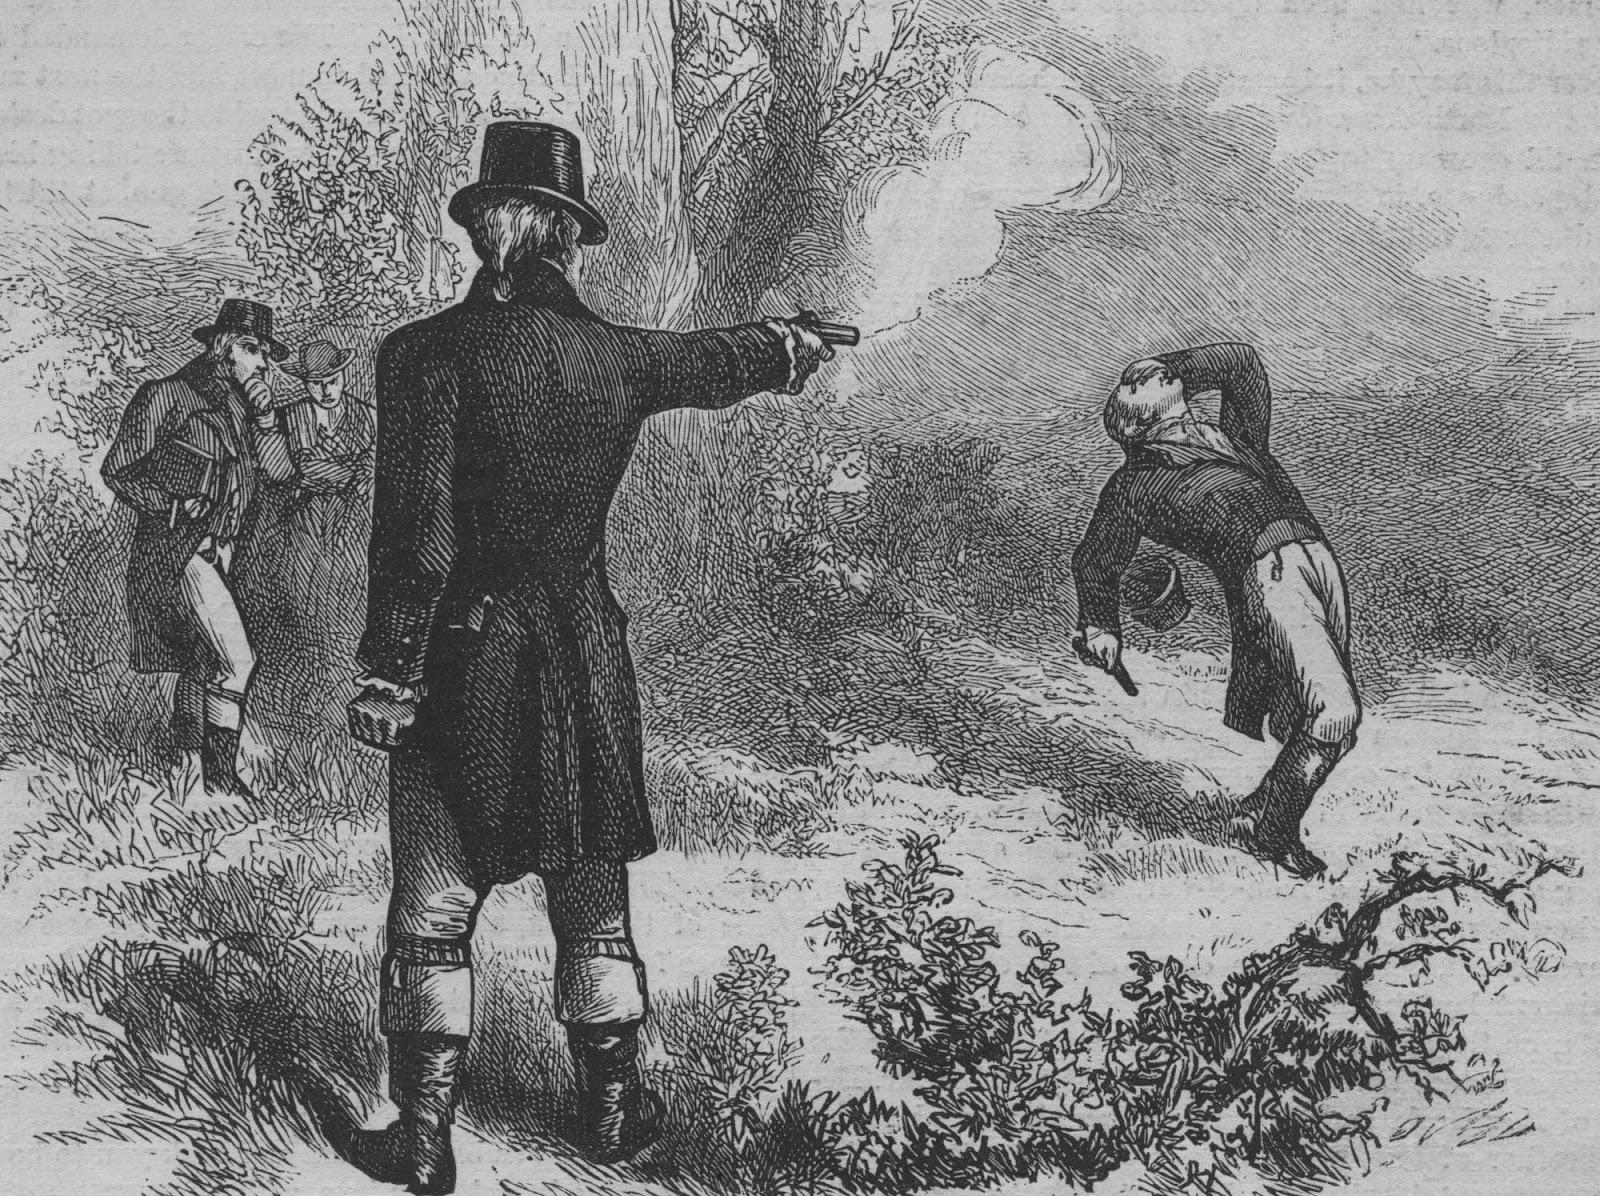 Eliza Lloyd: Etiquette for Gentlemen 1840 England: Dueling